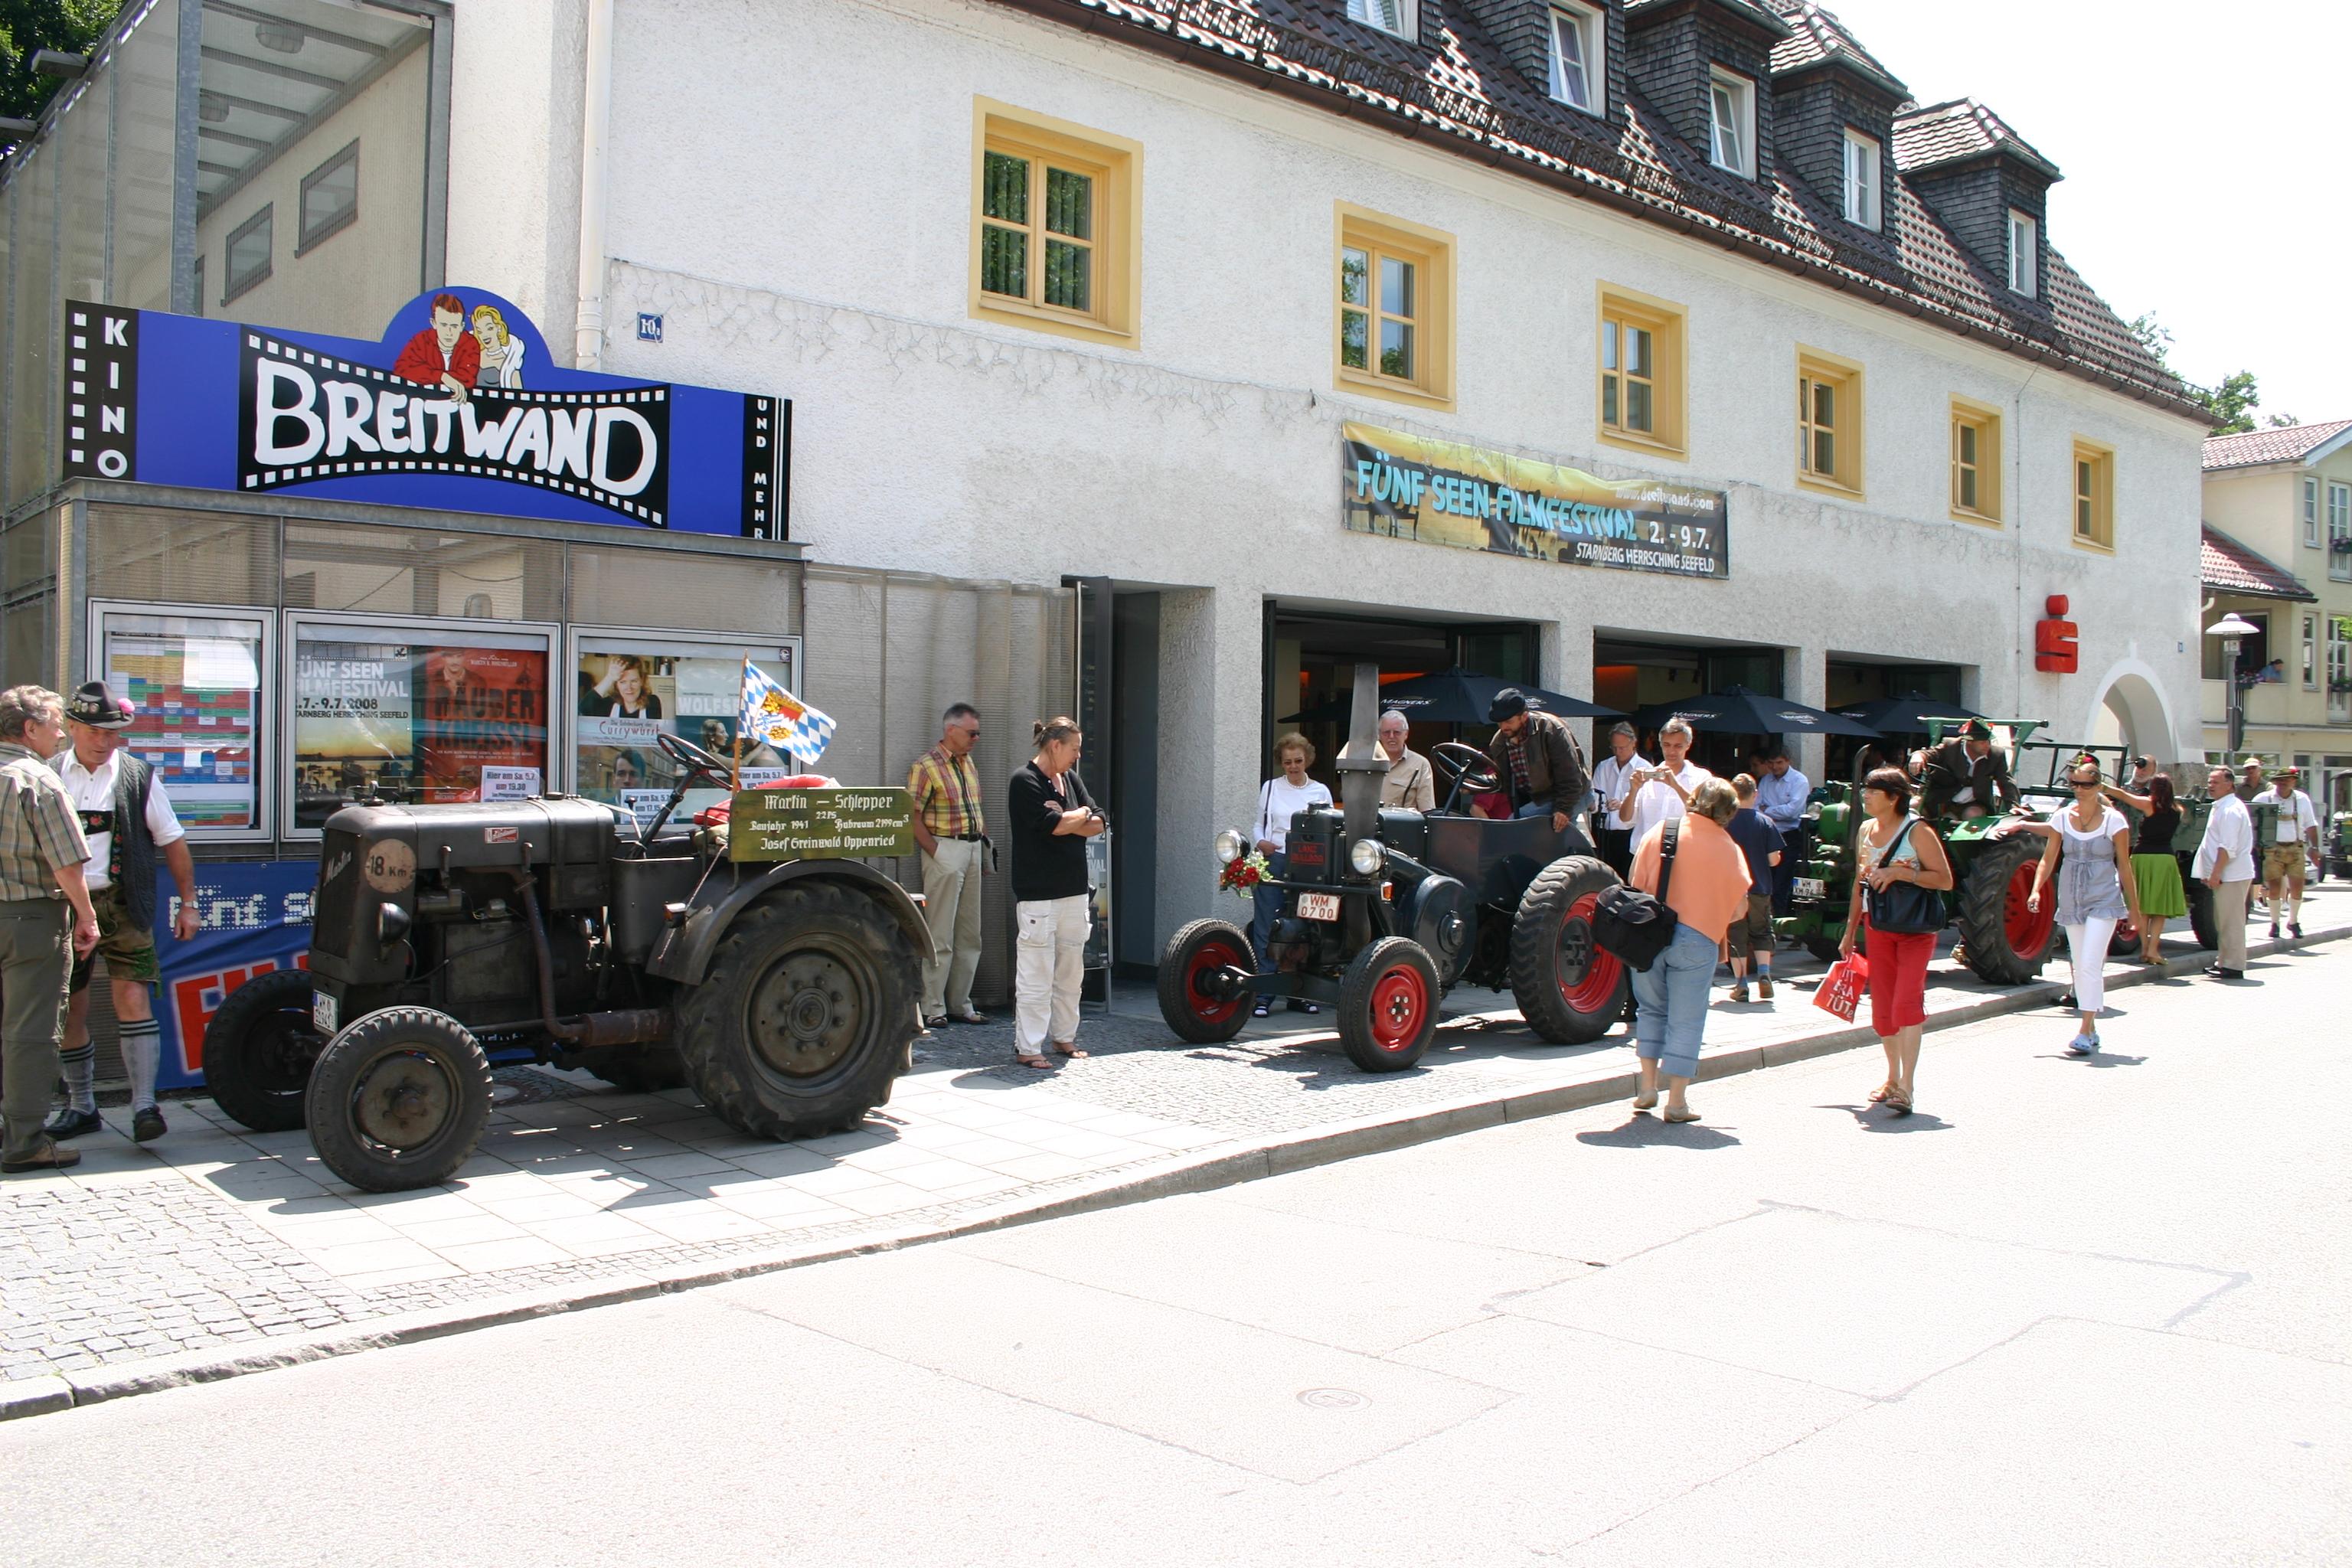 Kino Breitwand